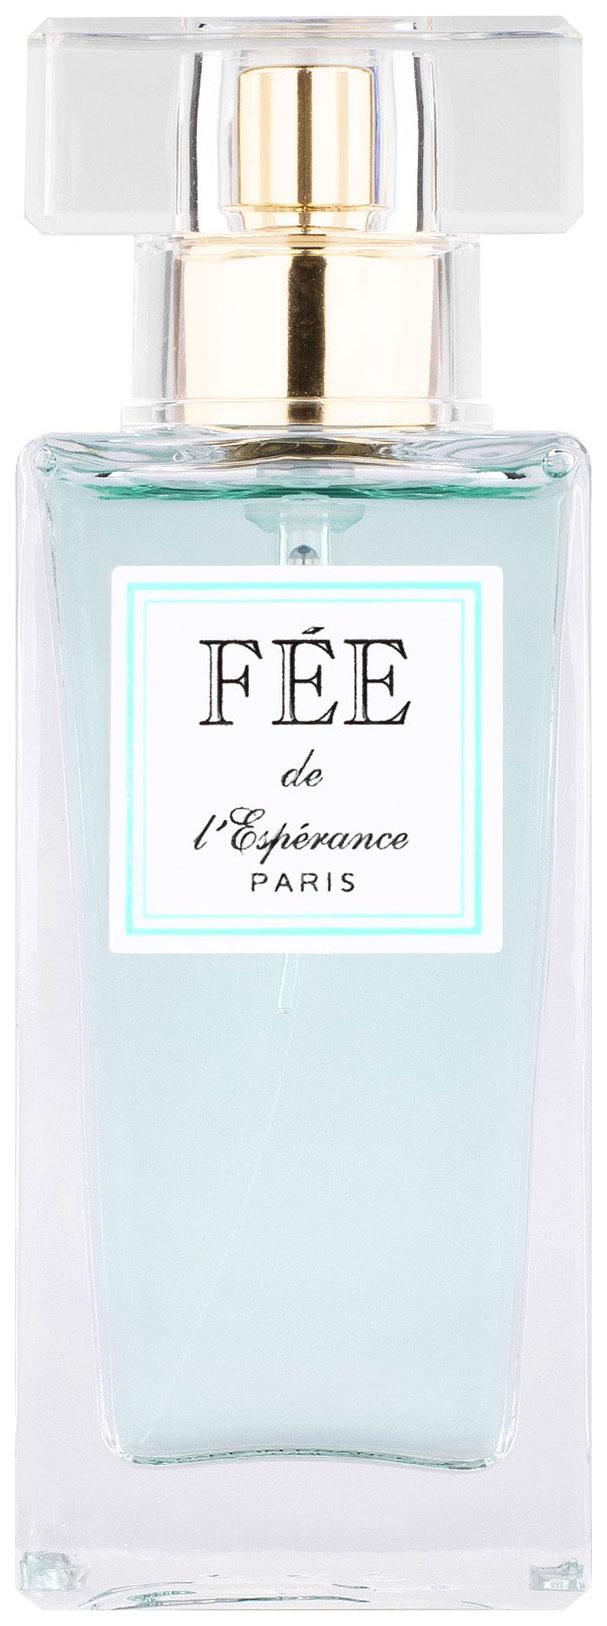 Парфюмерная вода Fee Fée de l'Esperance